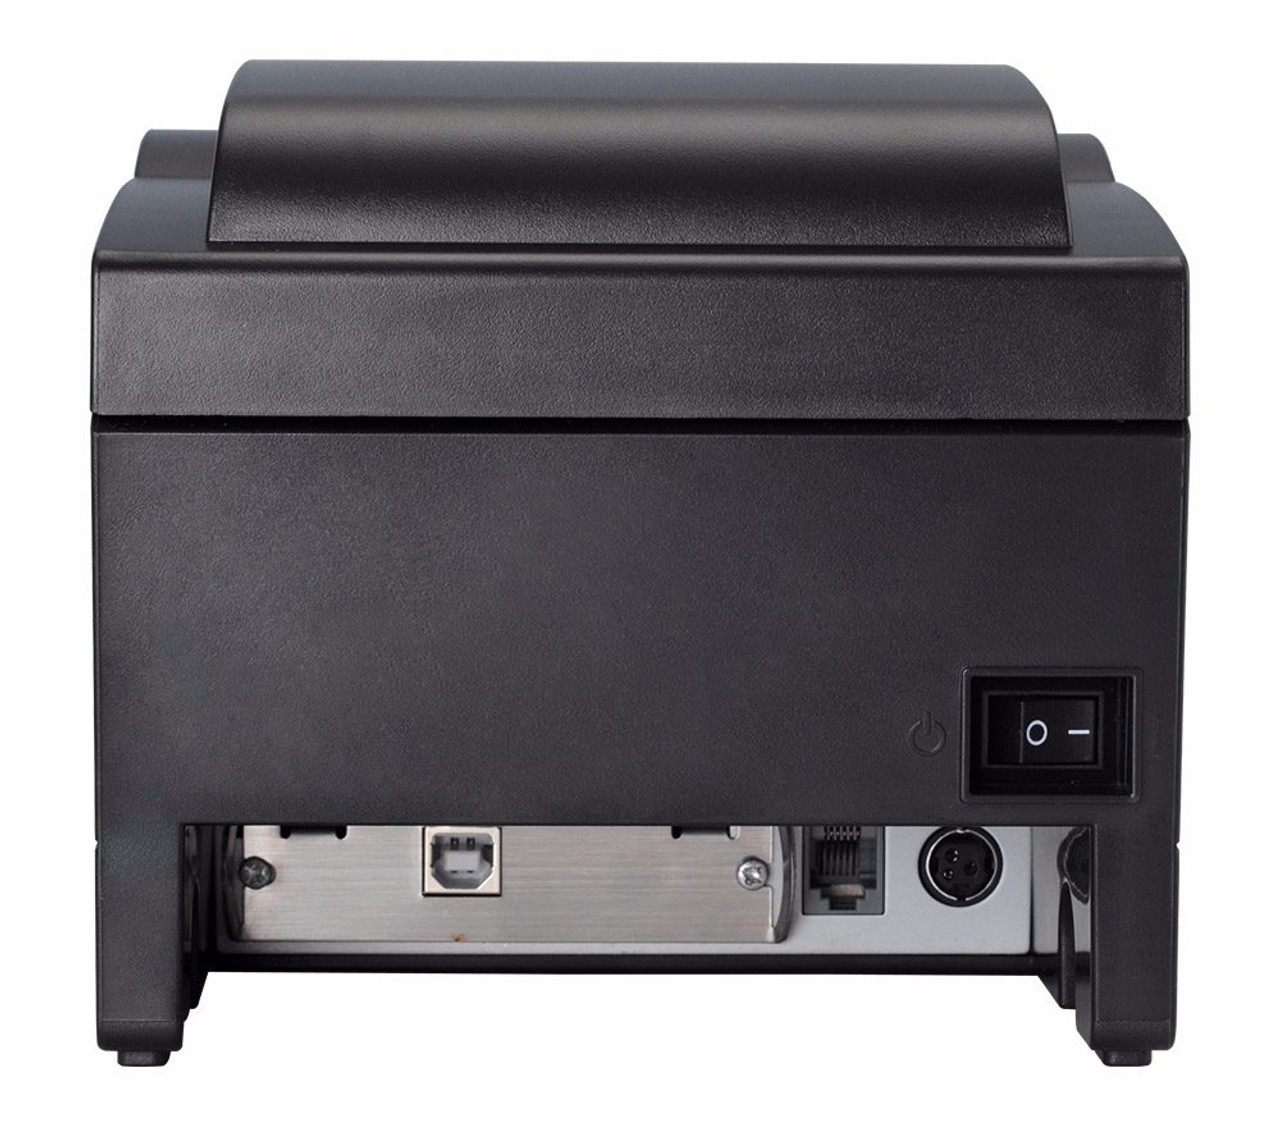 XP-76IIN Impact Dot matrix Printer